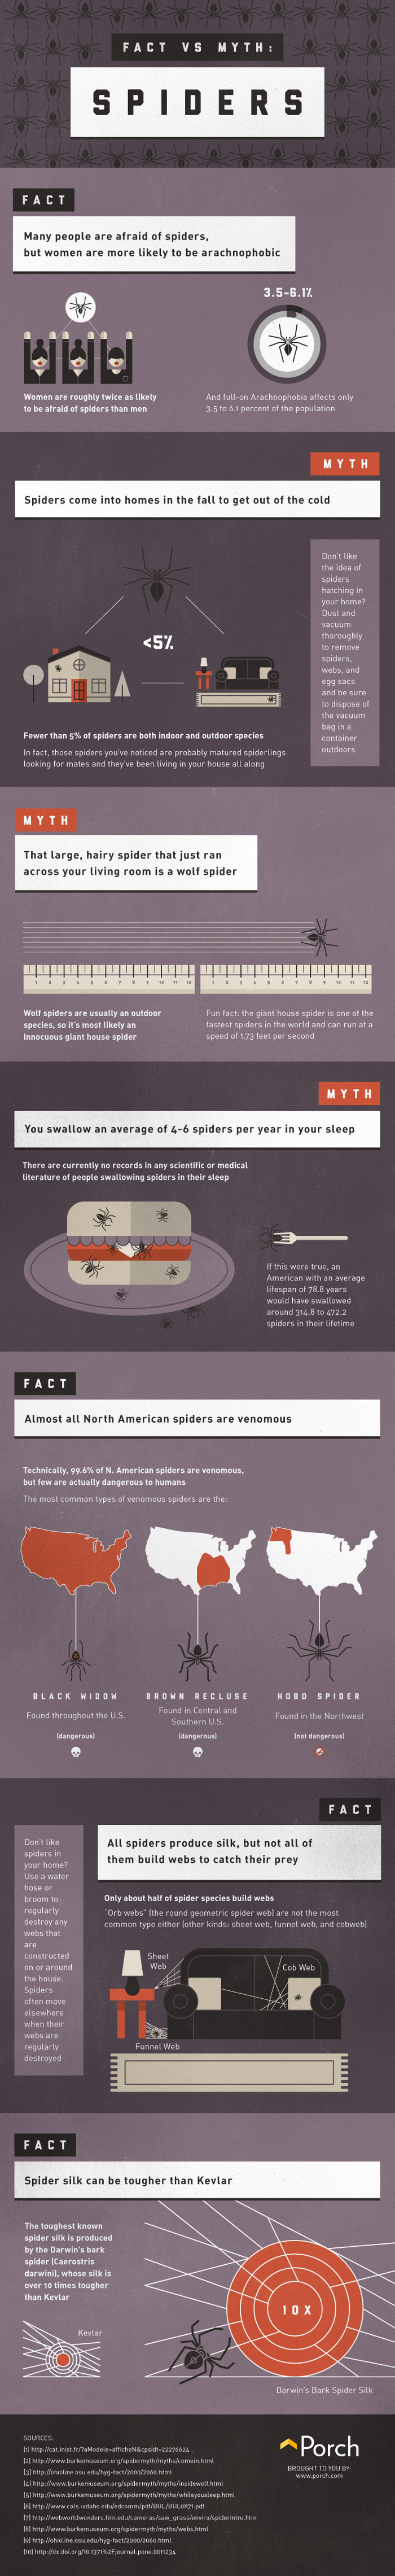 Bed Bug Bites Vs Spider Bites Hrfnd